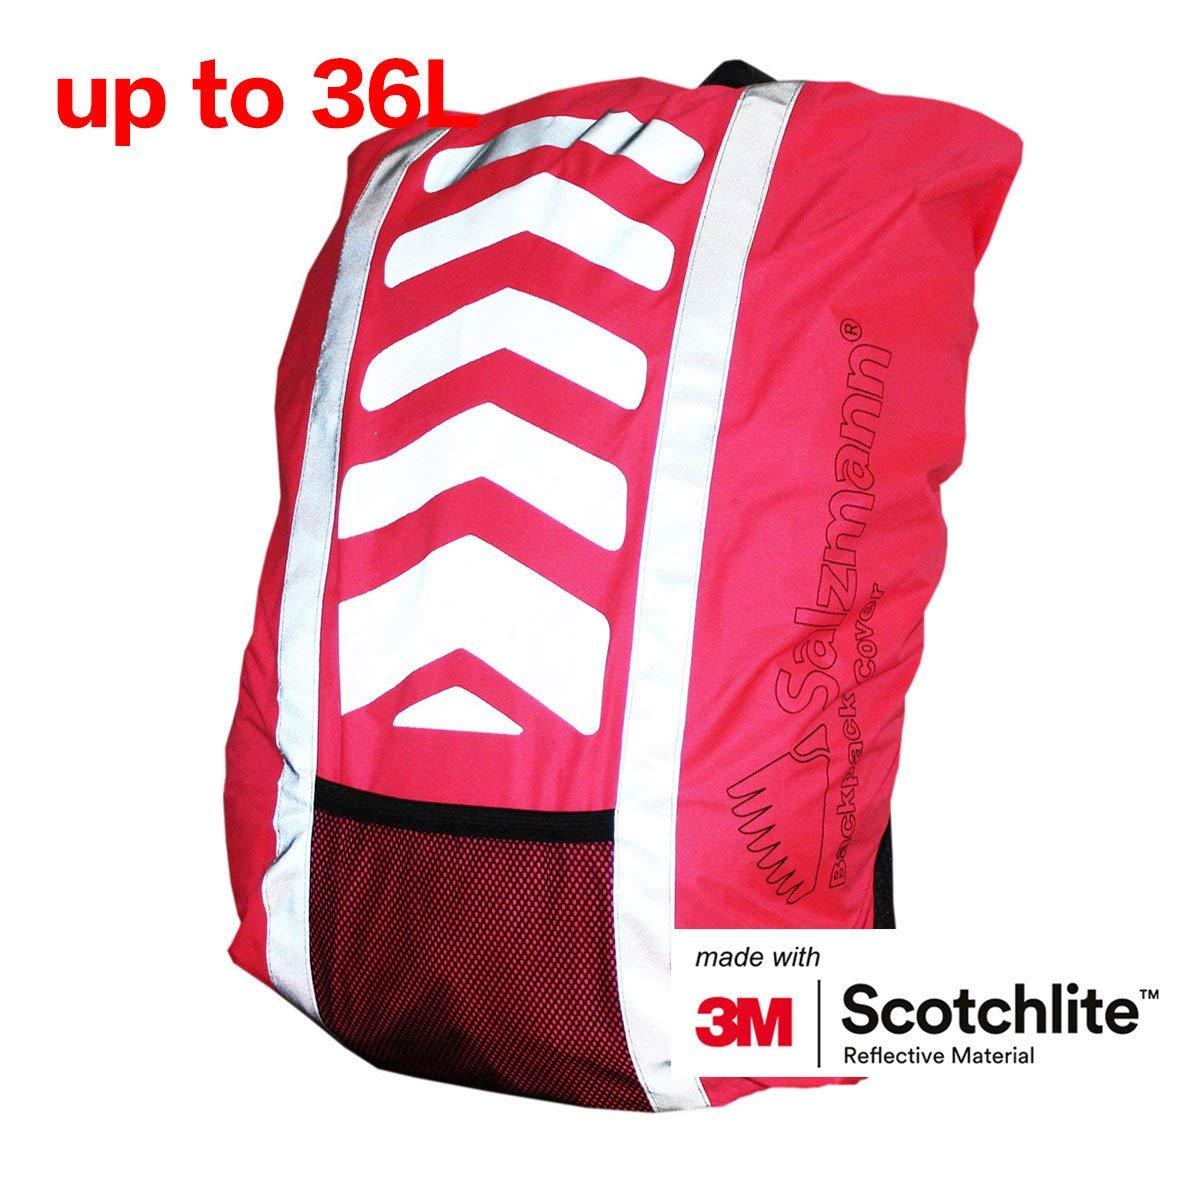 e9ea0c911798 Get Quotations · Salzmann 3M Reflective Backpack Cover